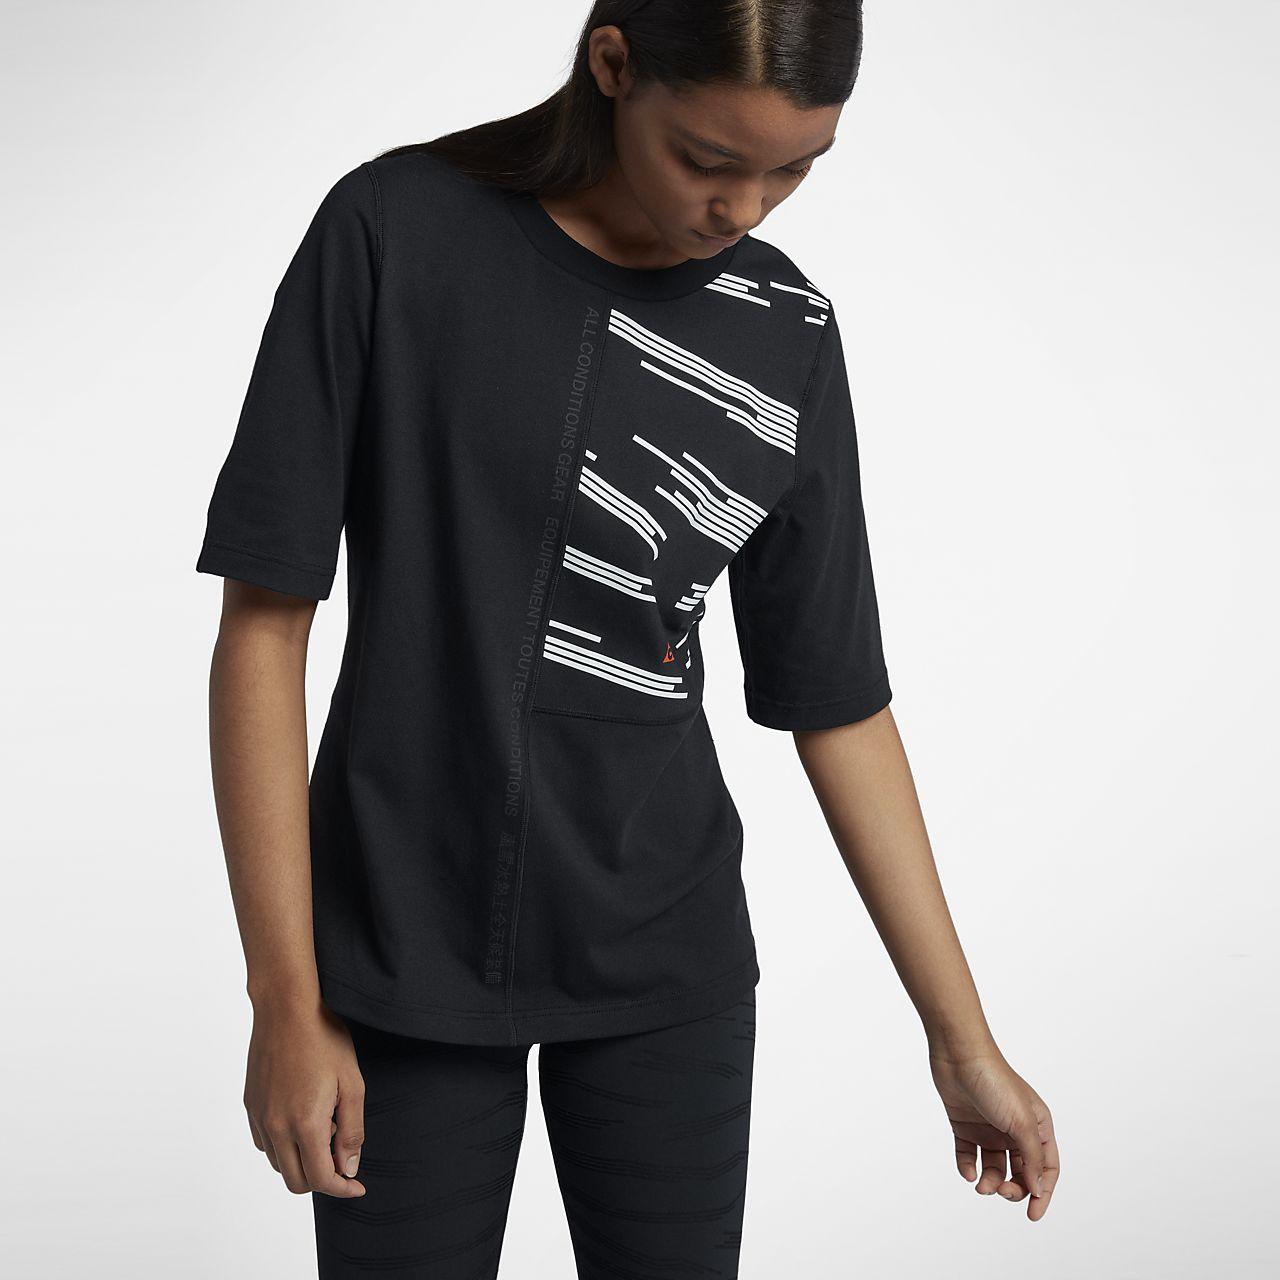 Acquista nike t shirt donne it OFF66% sconti